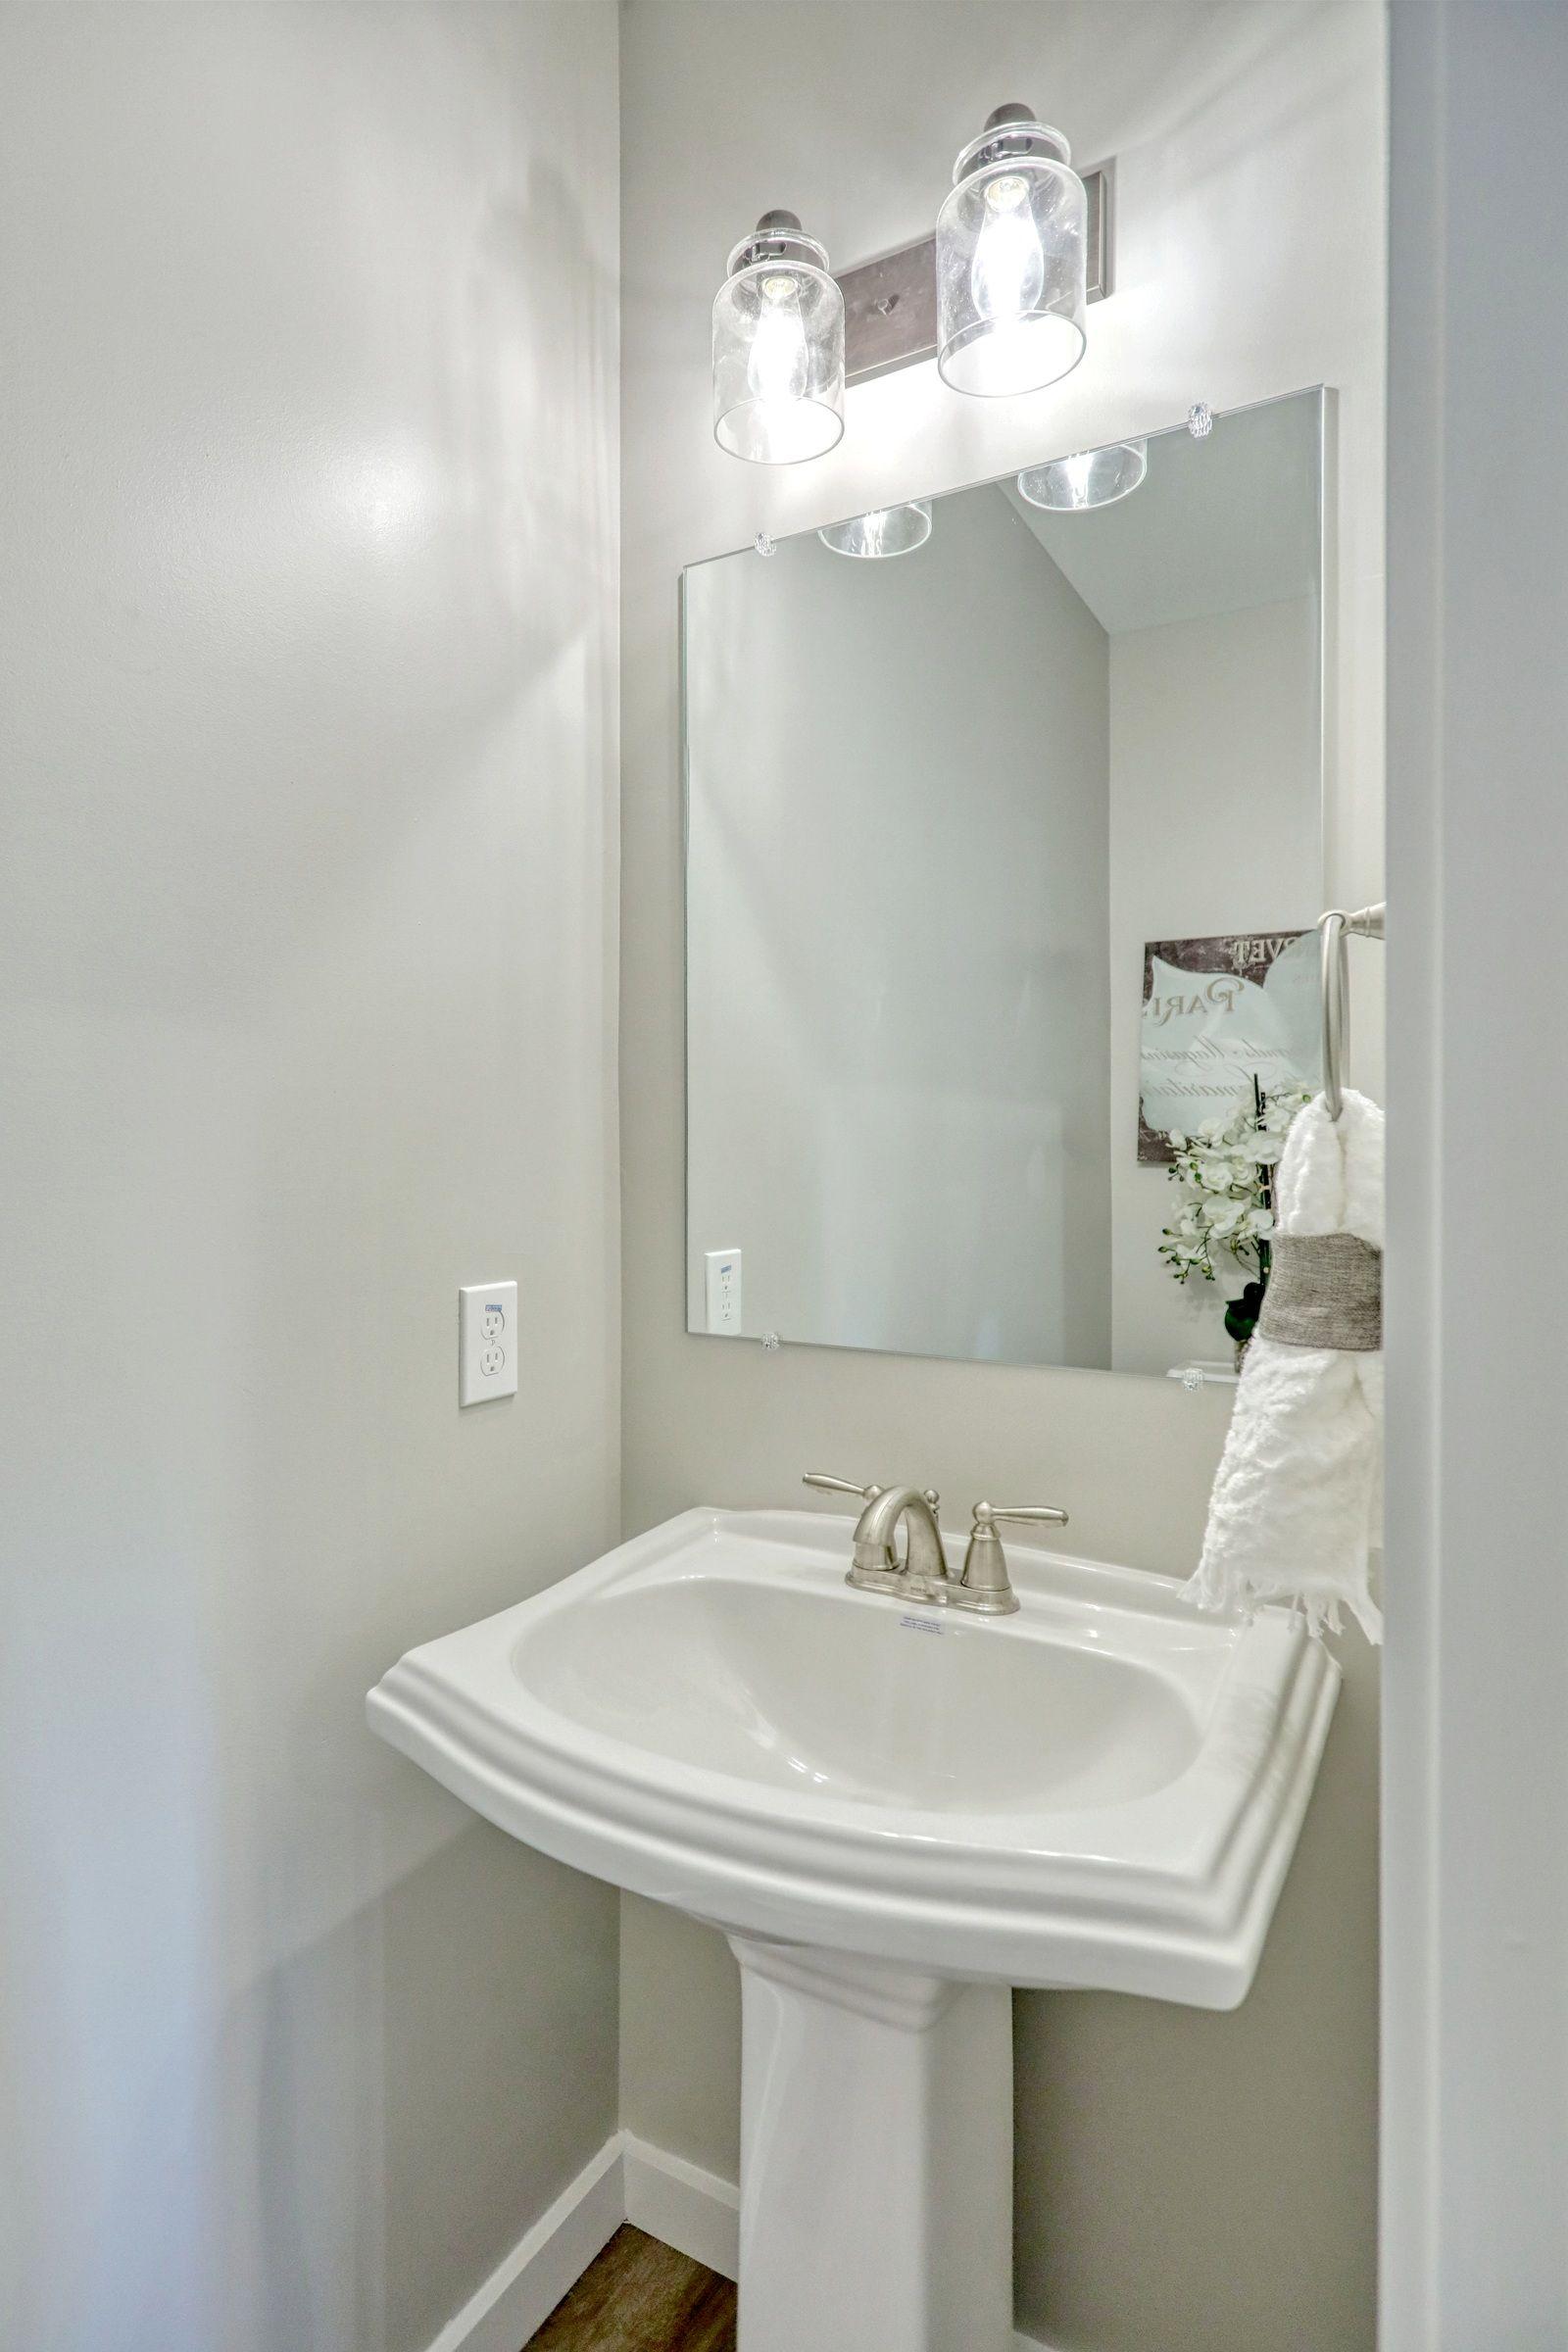 Bathroom featured in the Addison Vintage By Keystone Custom Homes in Philadelphia, PA